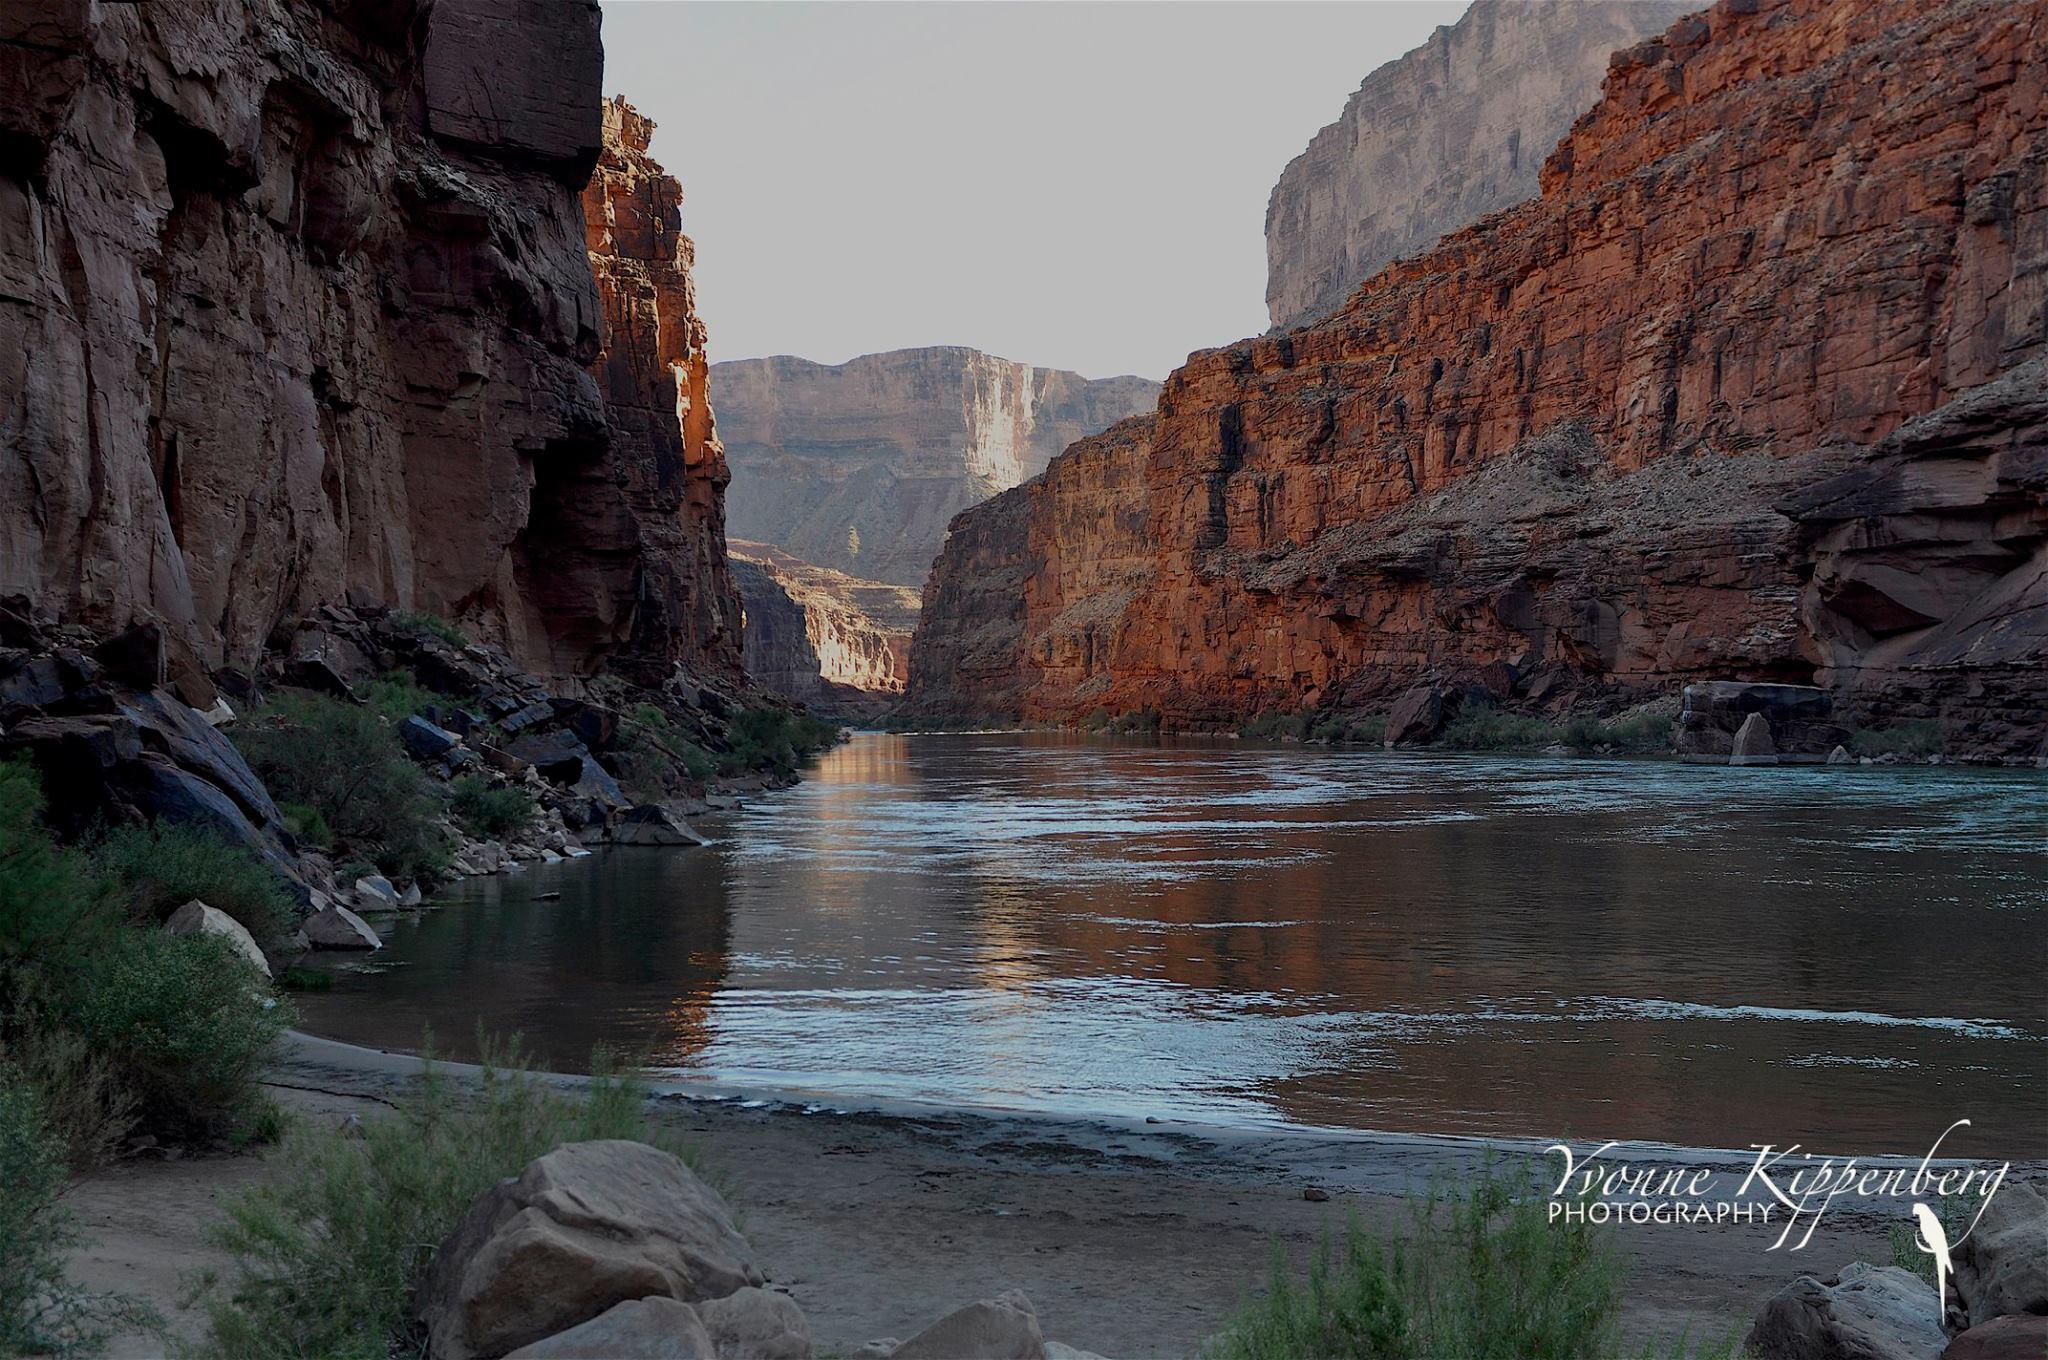 Colorado River by Yvonne Kippenberg